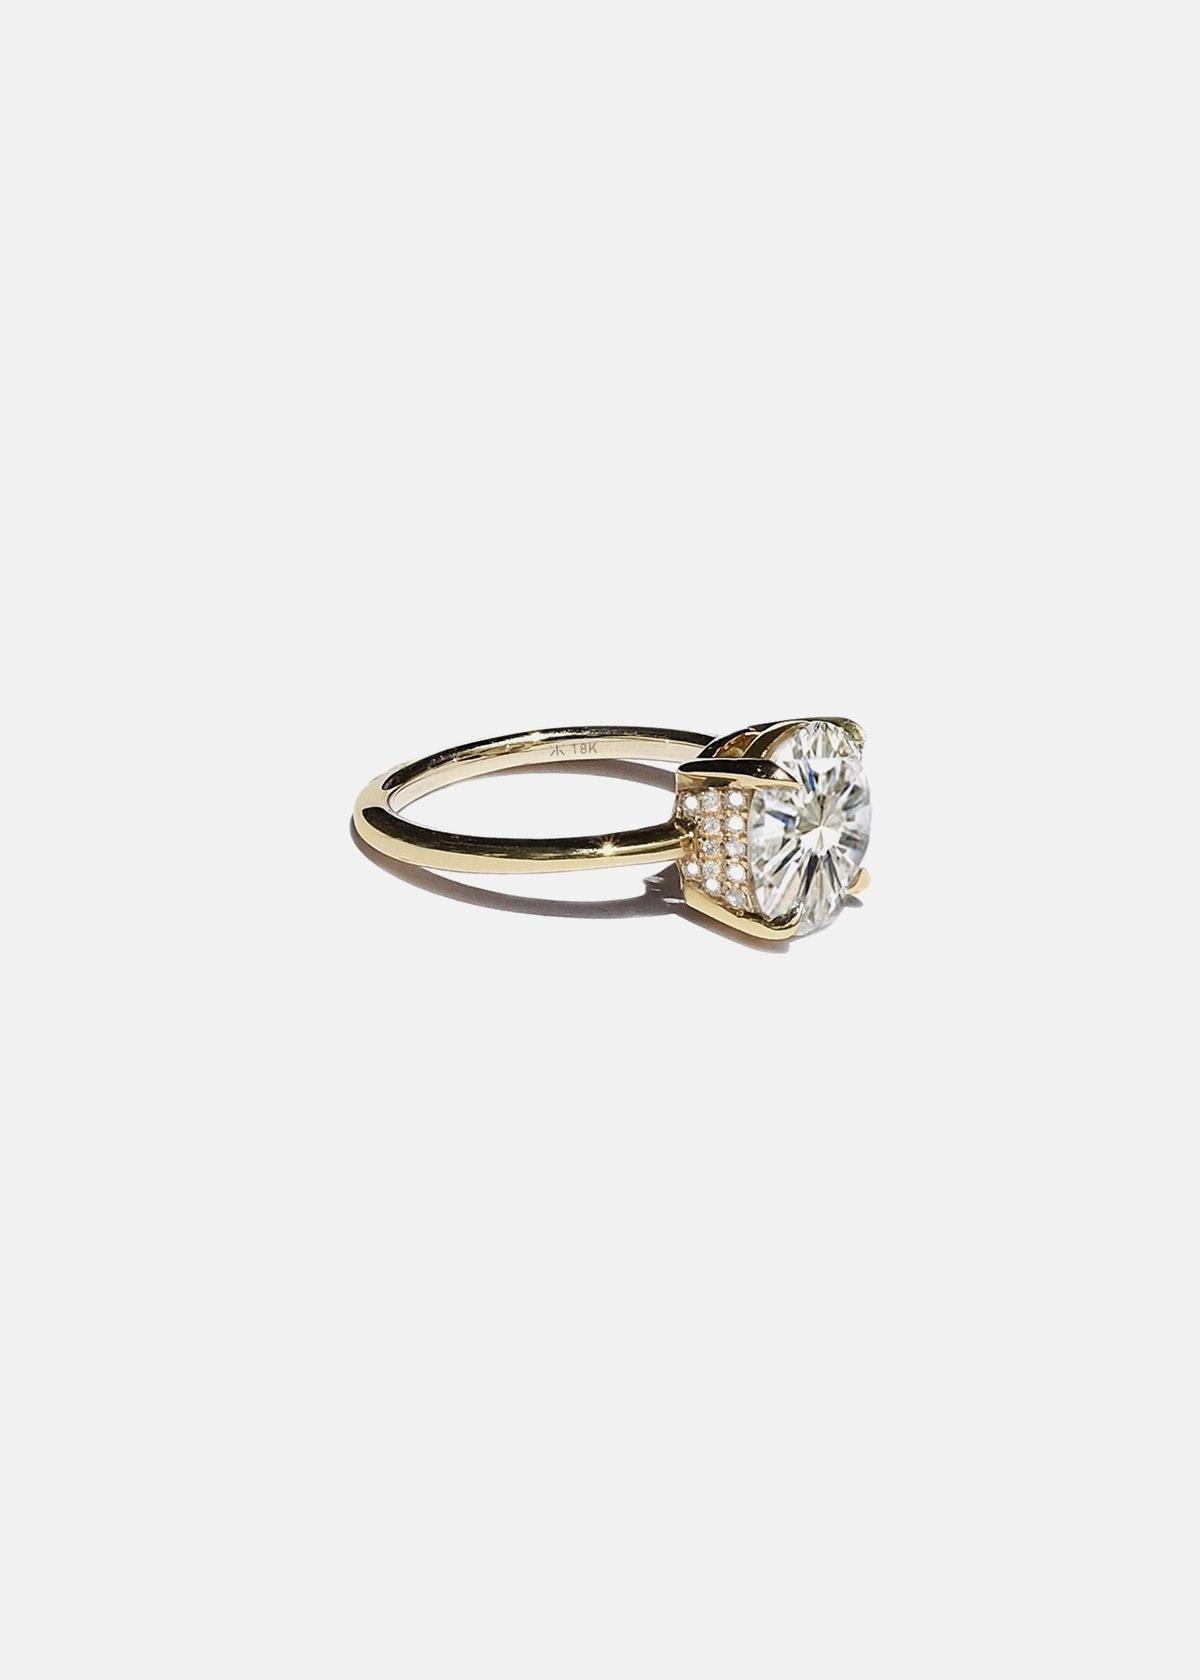 Cerré Solitaire engagement ring from KATKIM.